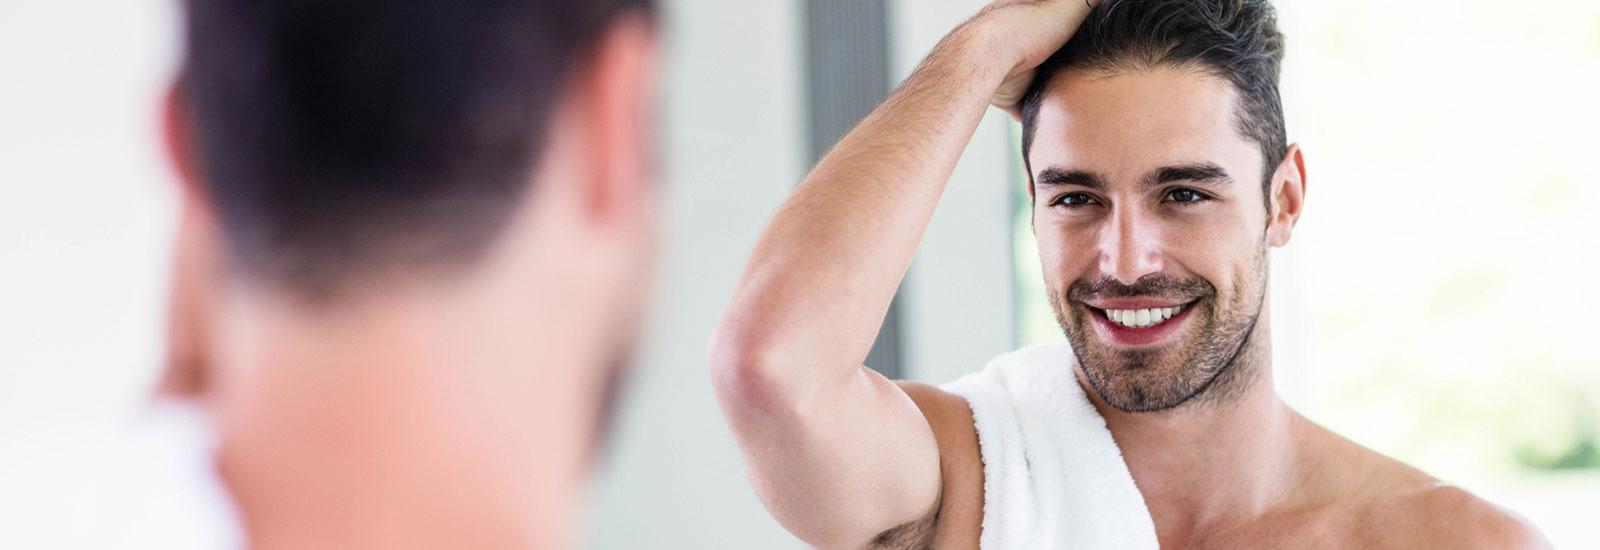 Skincare For Men - The Pearl Dermatology